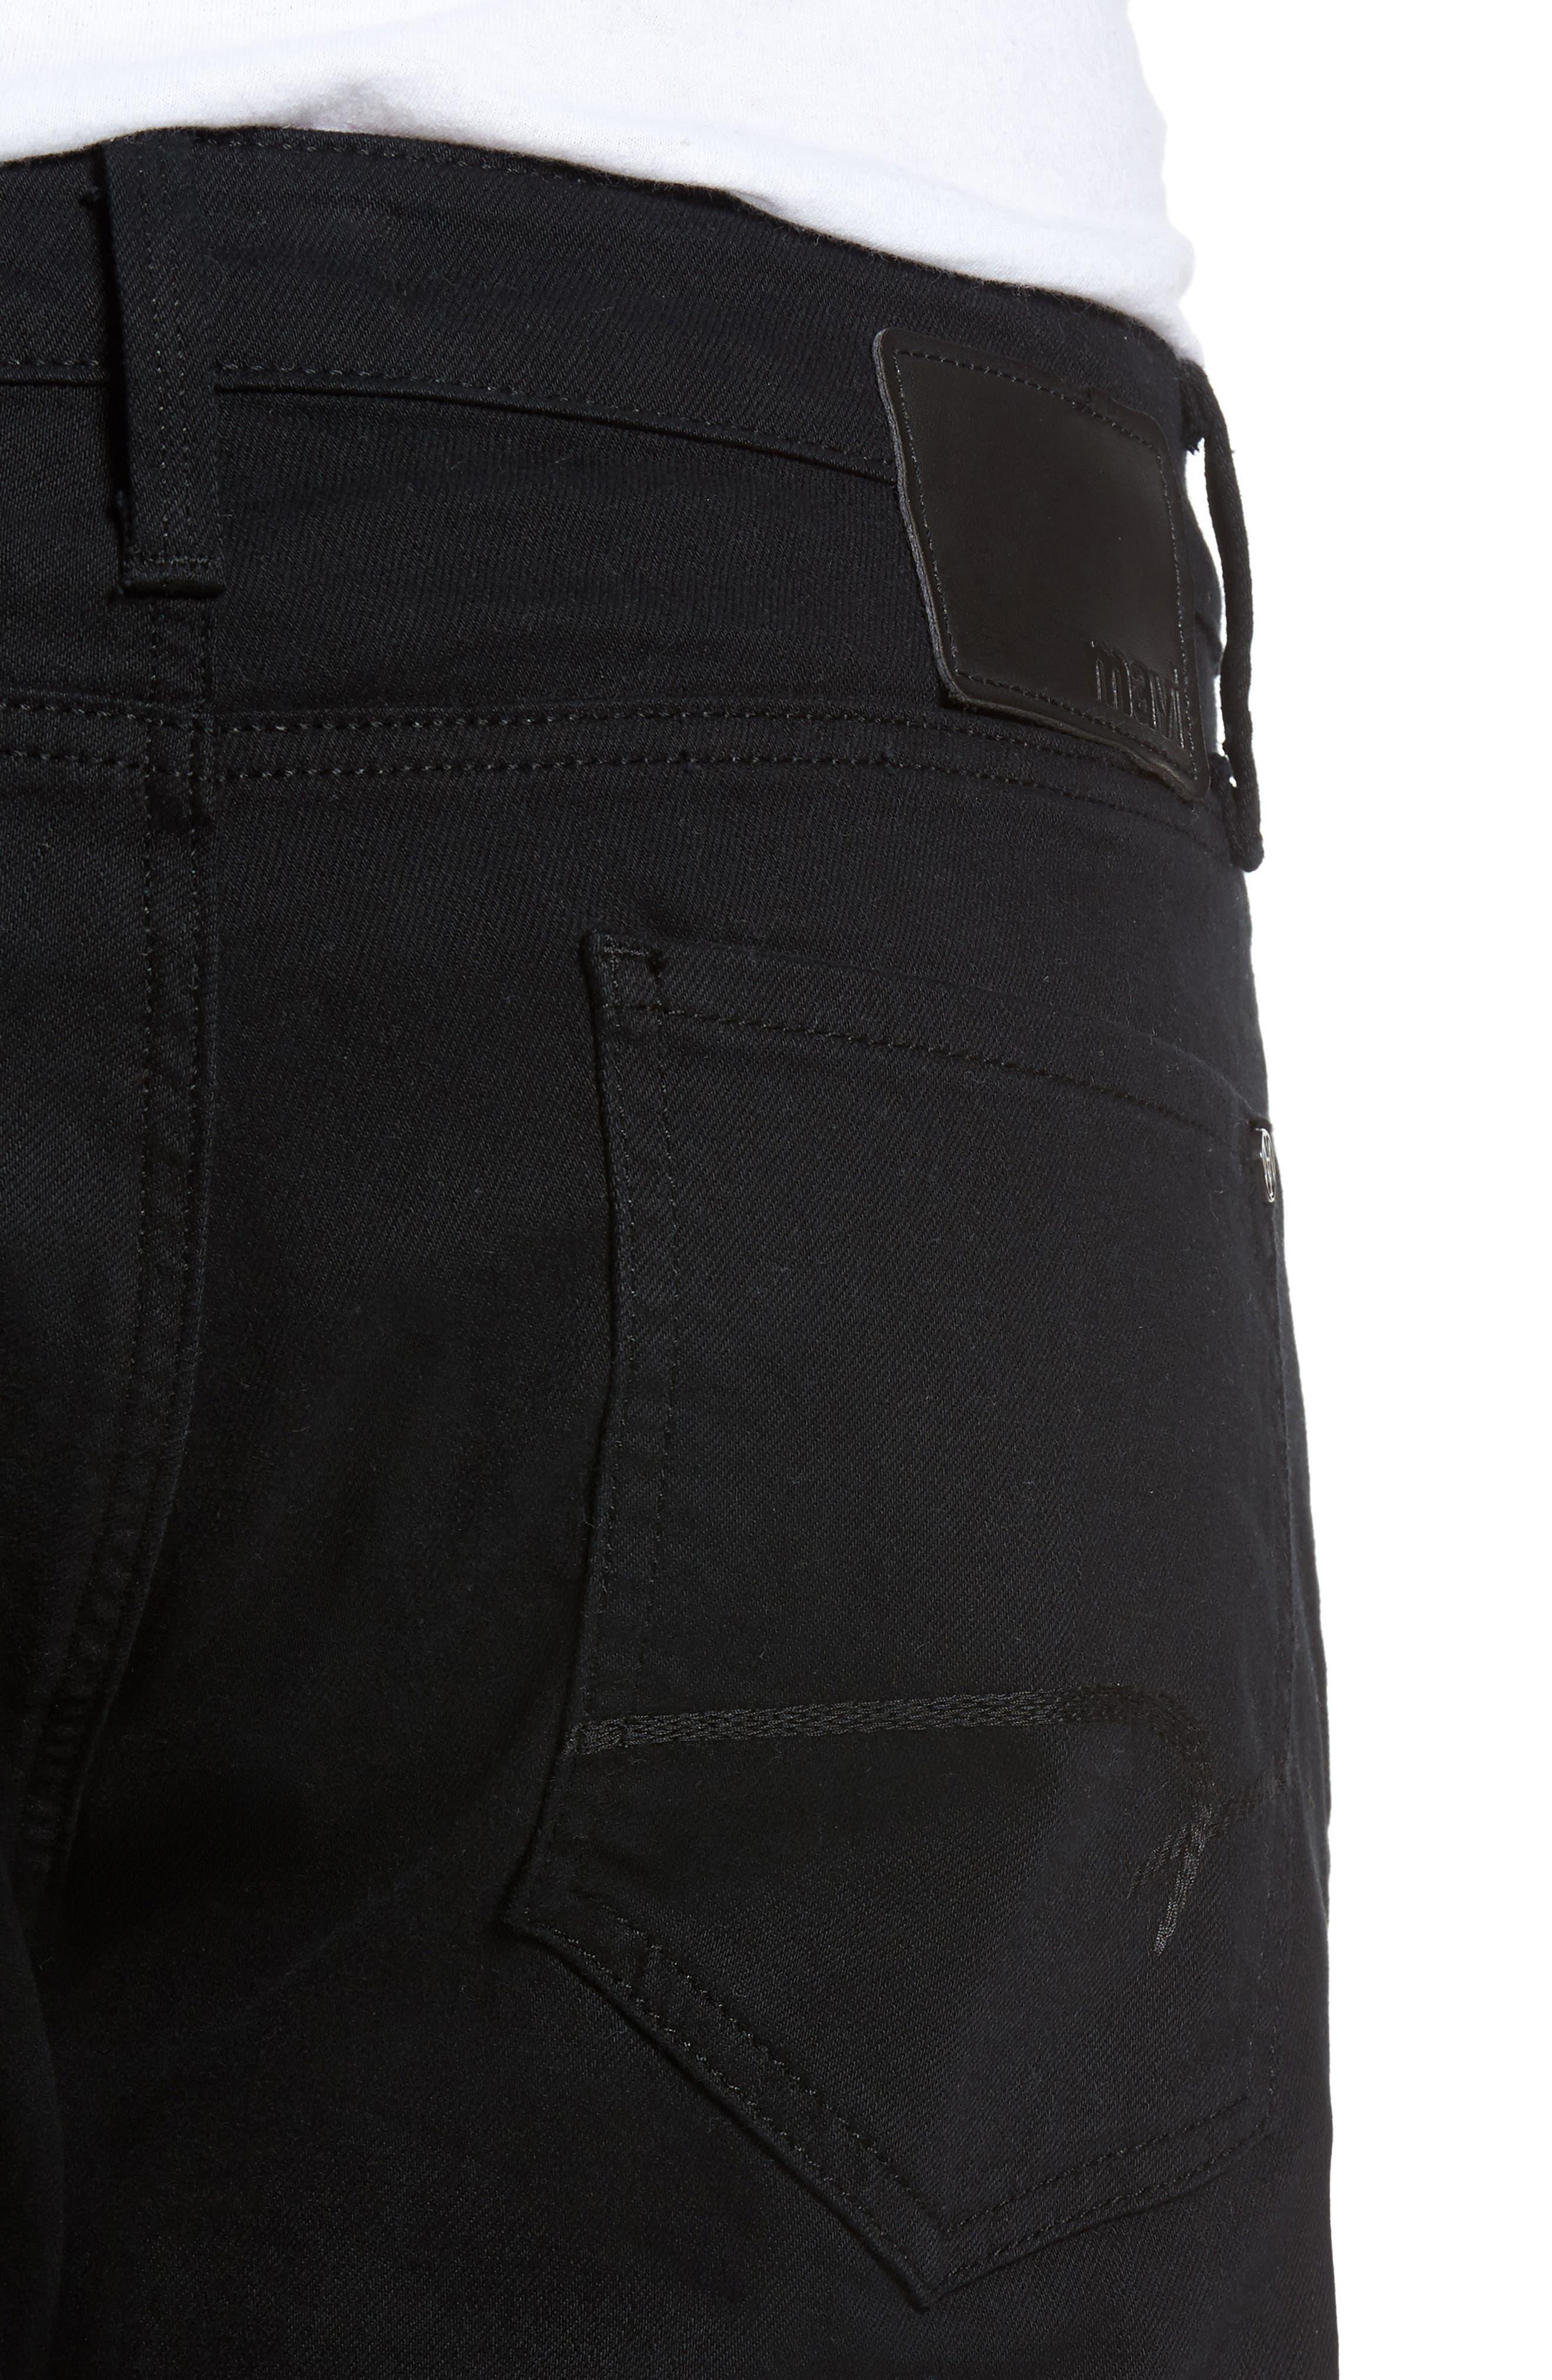 Zach Straight Leg Jeans,                             Alternate thumbnail 4, color,                             BLACK WILLIAMSBURG